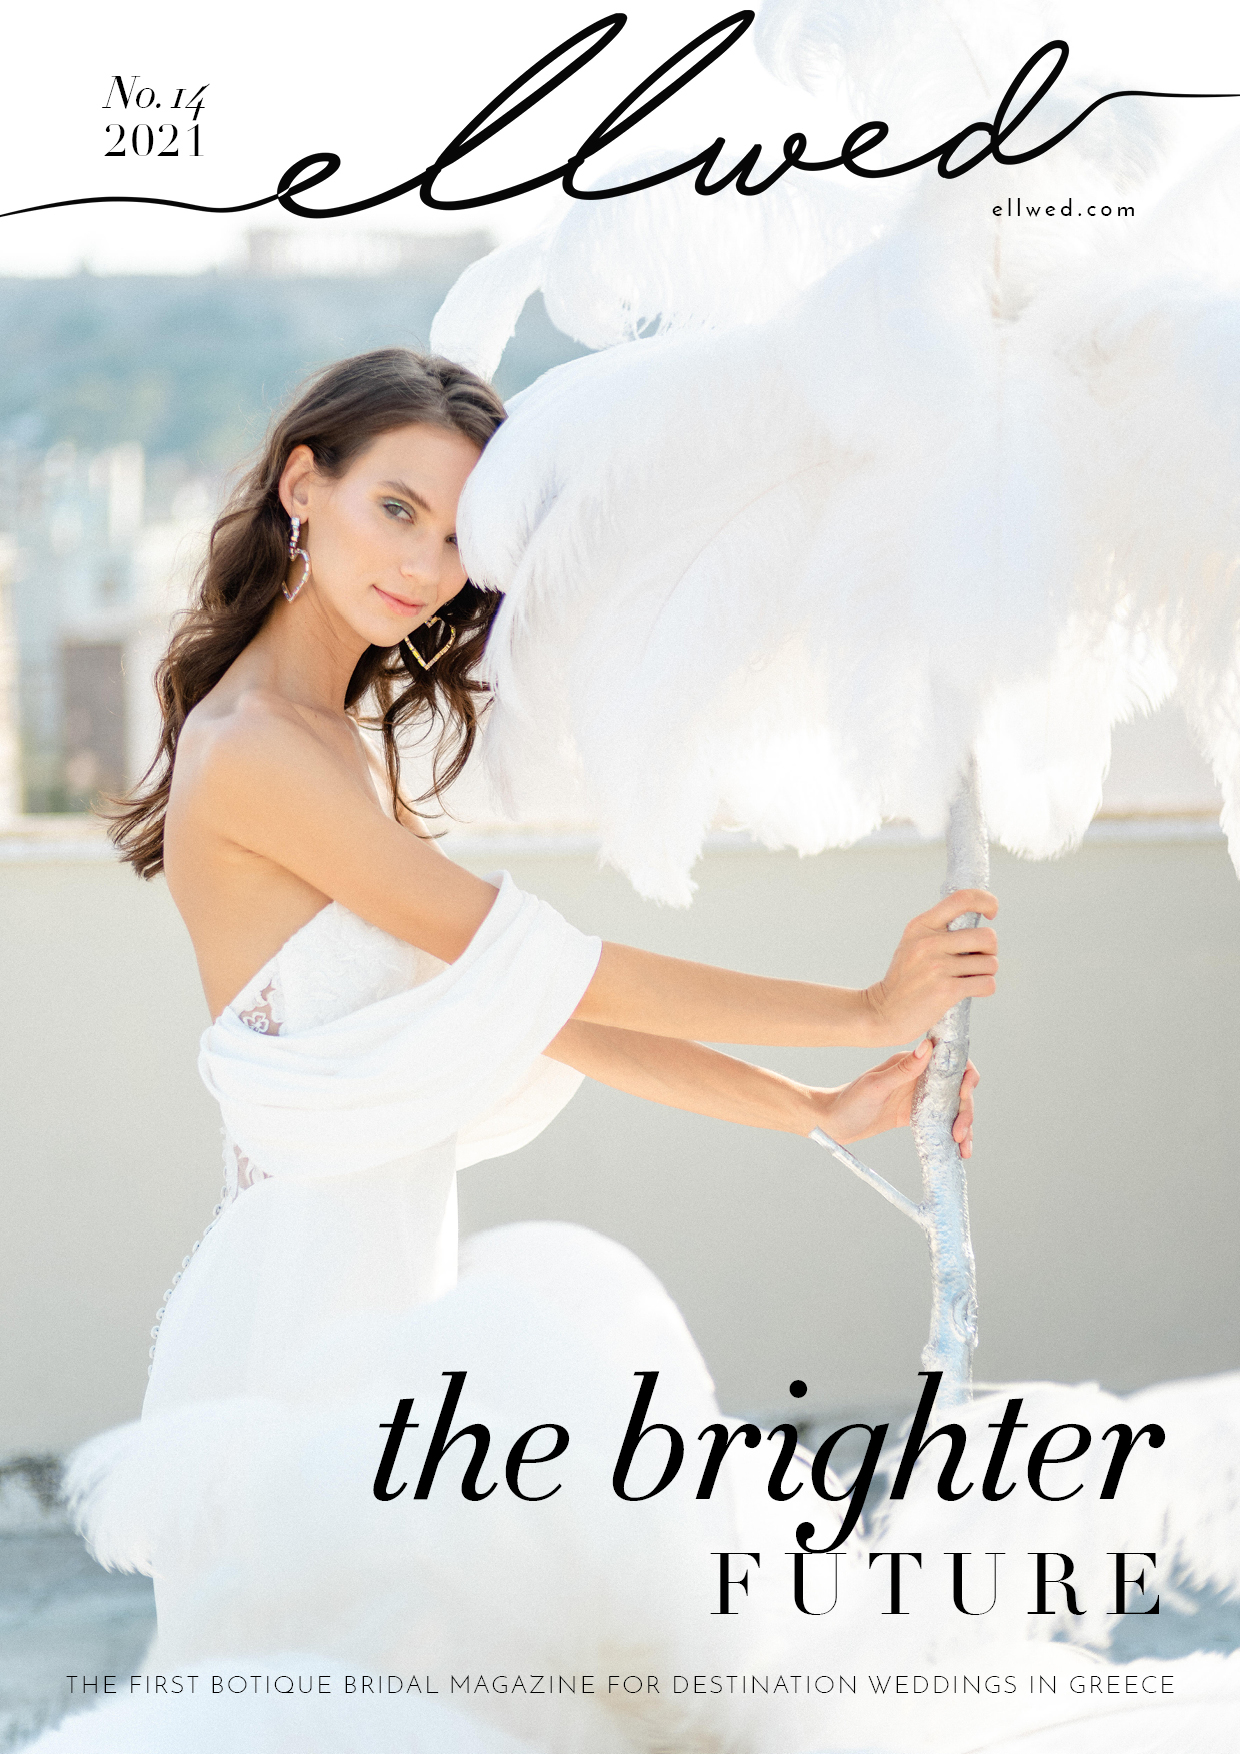 Cover of Ellwed digital Magazine for destination weddings in Greece